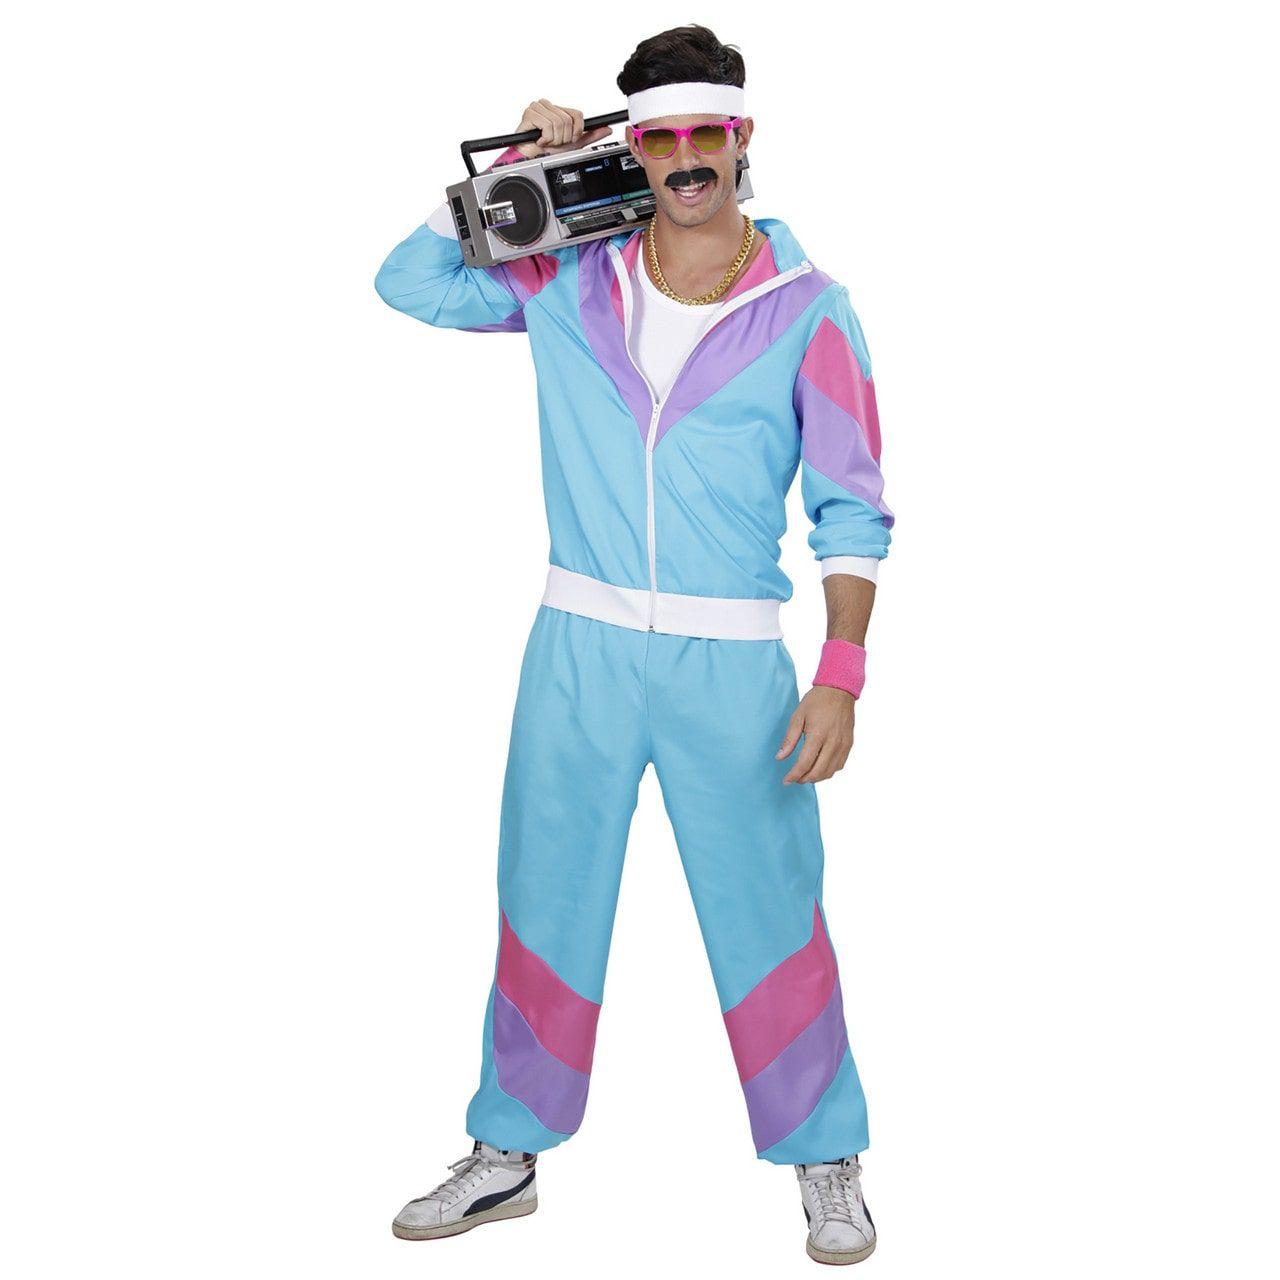 Fout Blauw New Kids 80s Trainingpak Volwassen Kostuum